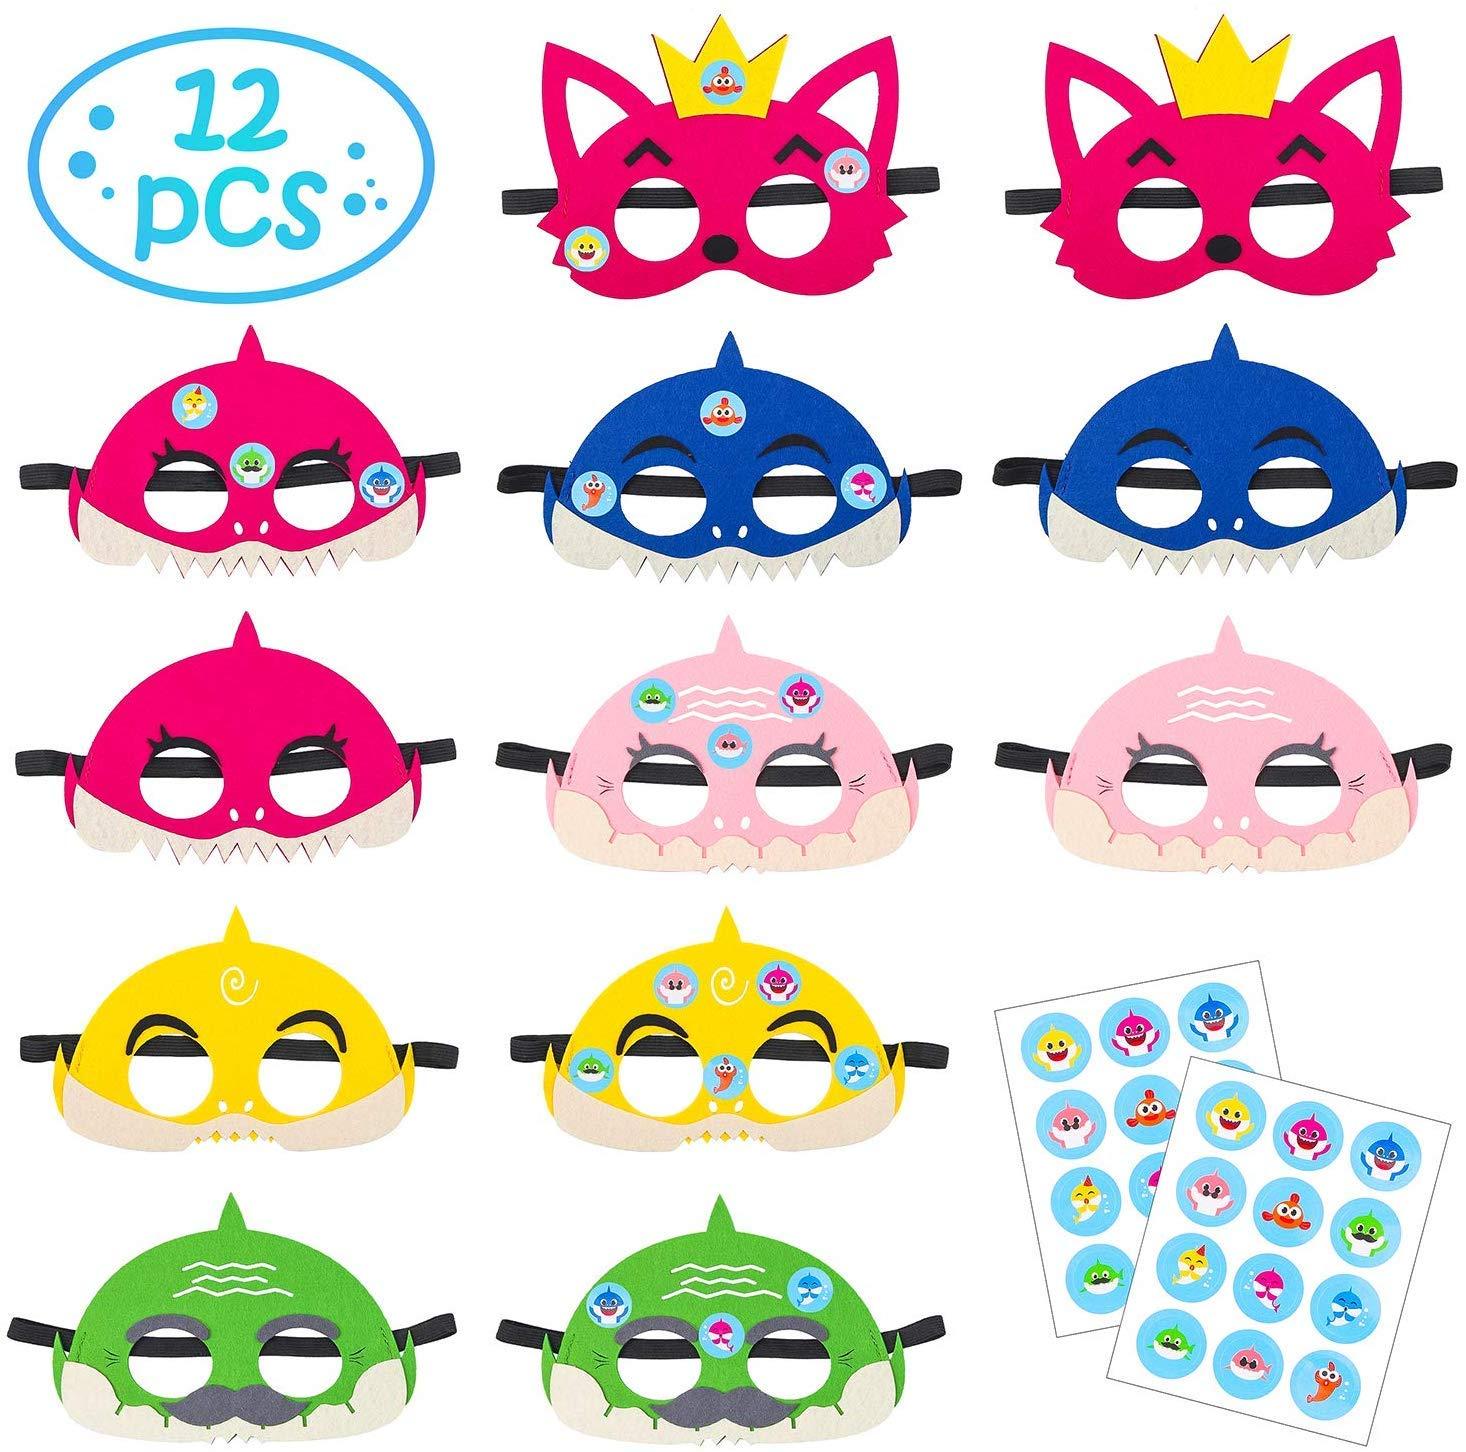 BESLIME Baby Shark Masks, Little Shark Masks Set Shark Party Favors Children Cosplay Soft Mask Half Masks Birthday Themed Party Masks with Cute Shark Stickers Felt Masks for Kids Boys Girls,12Pcs